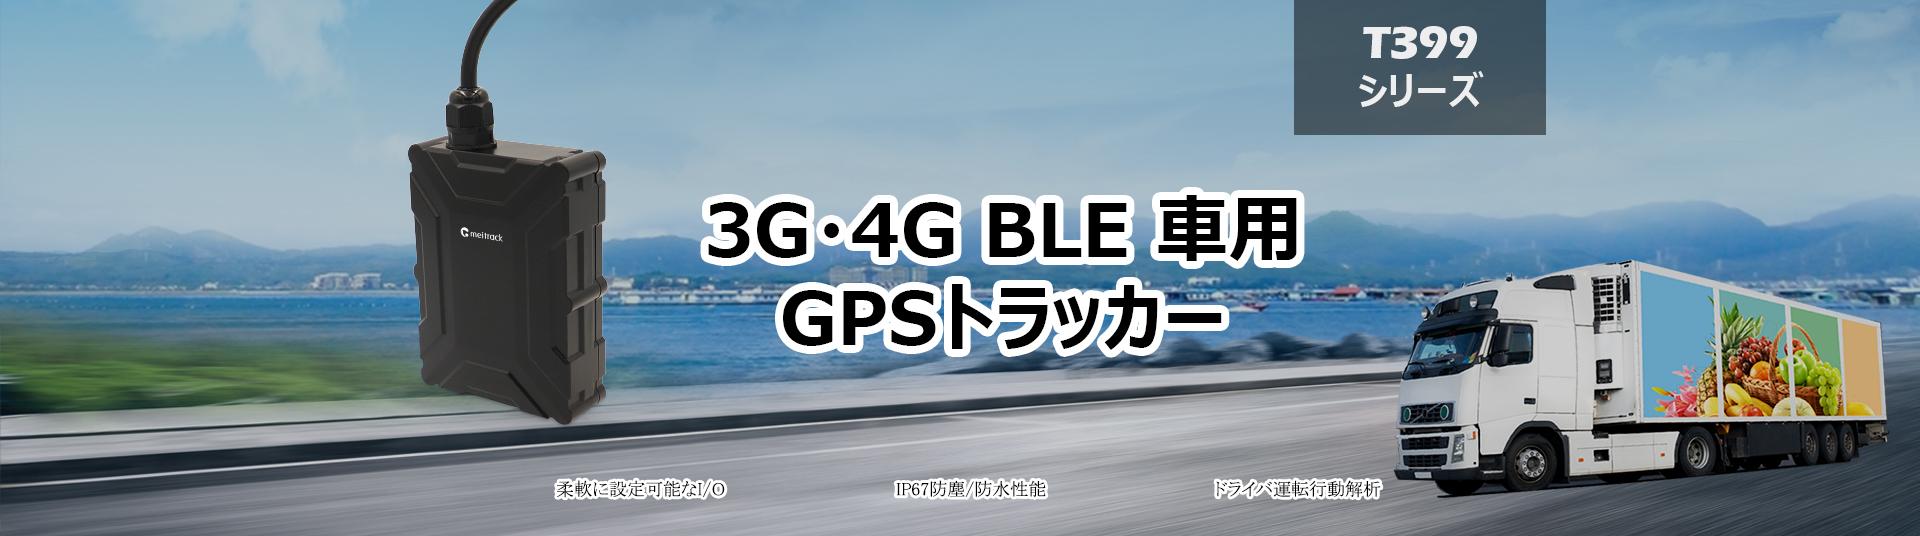 T399-Series-banner_jp